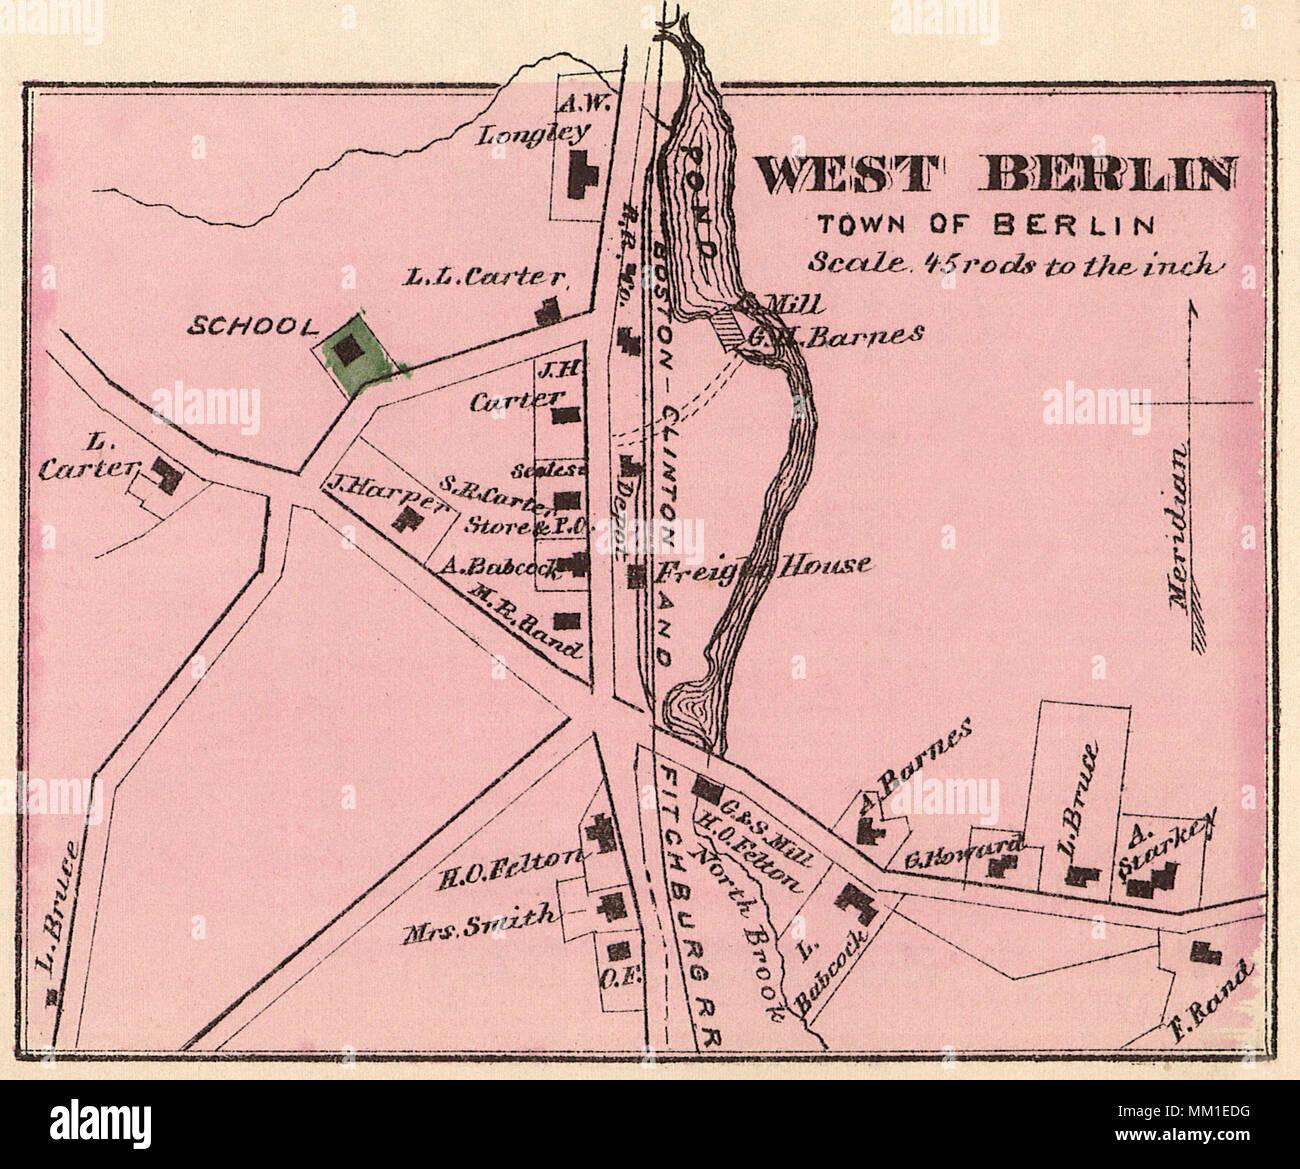 West Berlin Karte.Karte Von West Berlin 1870 Stockfoto Bild 184430108 Alamy